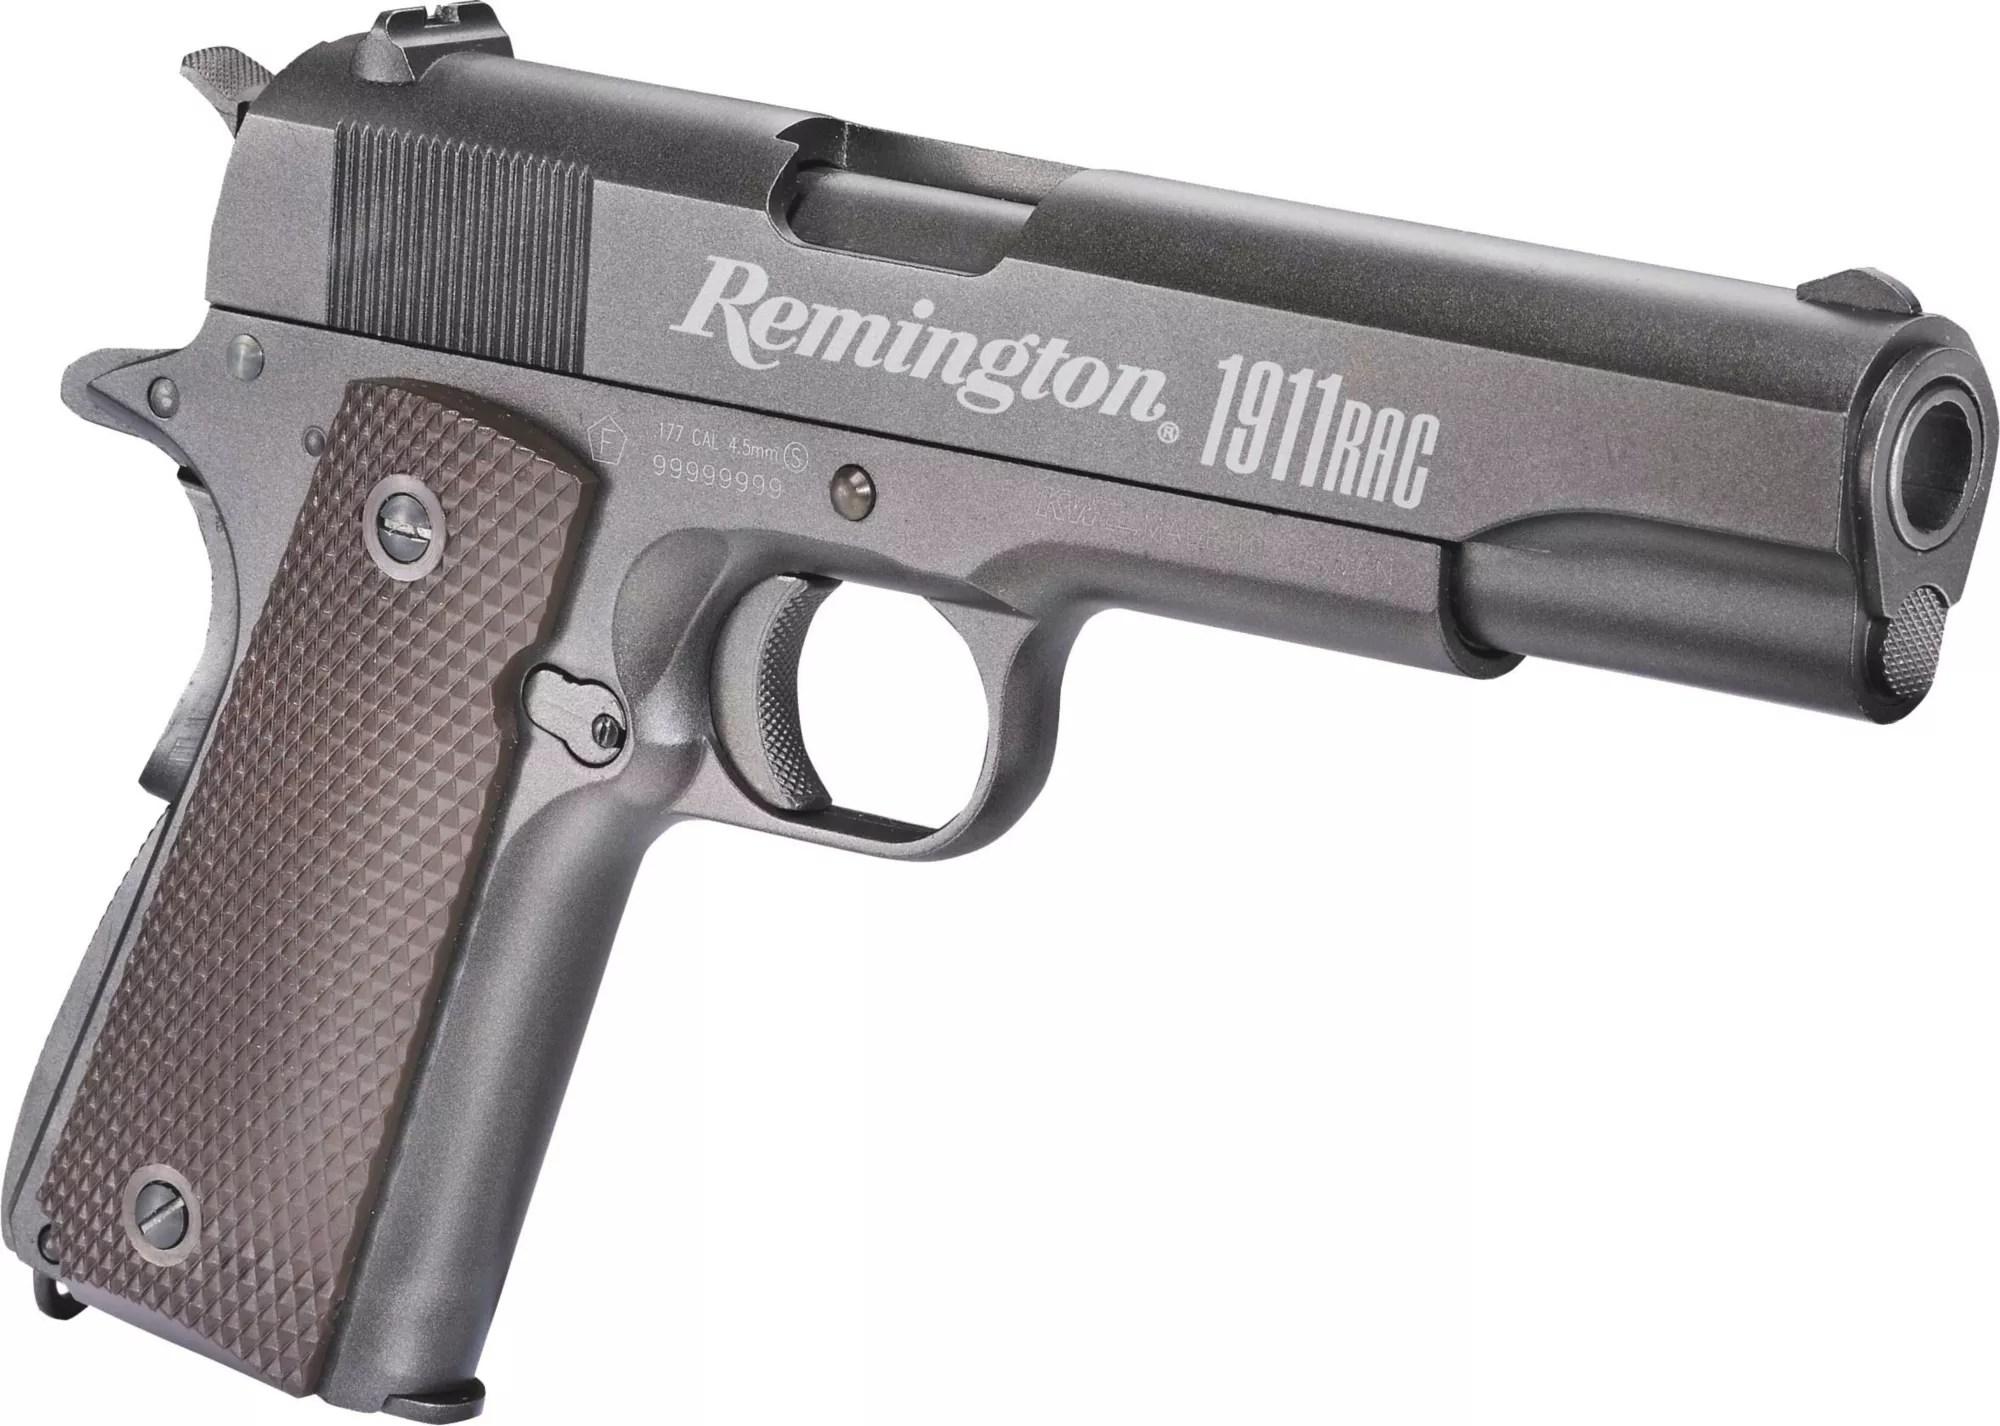 medium resolution of remington 1911rac blowback bb gun 1